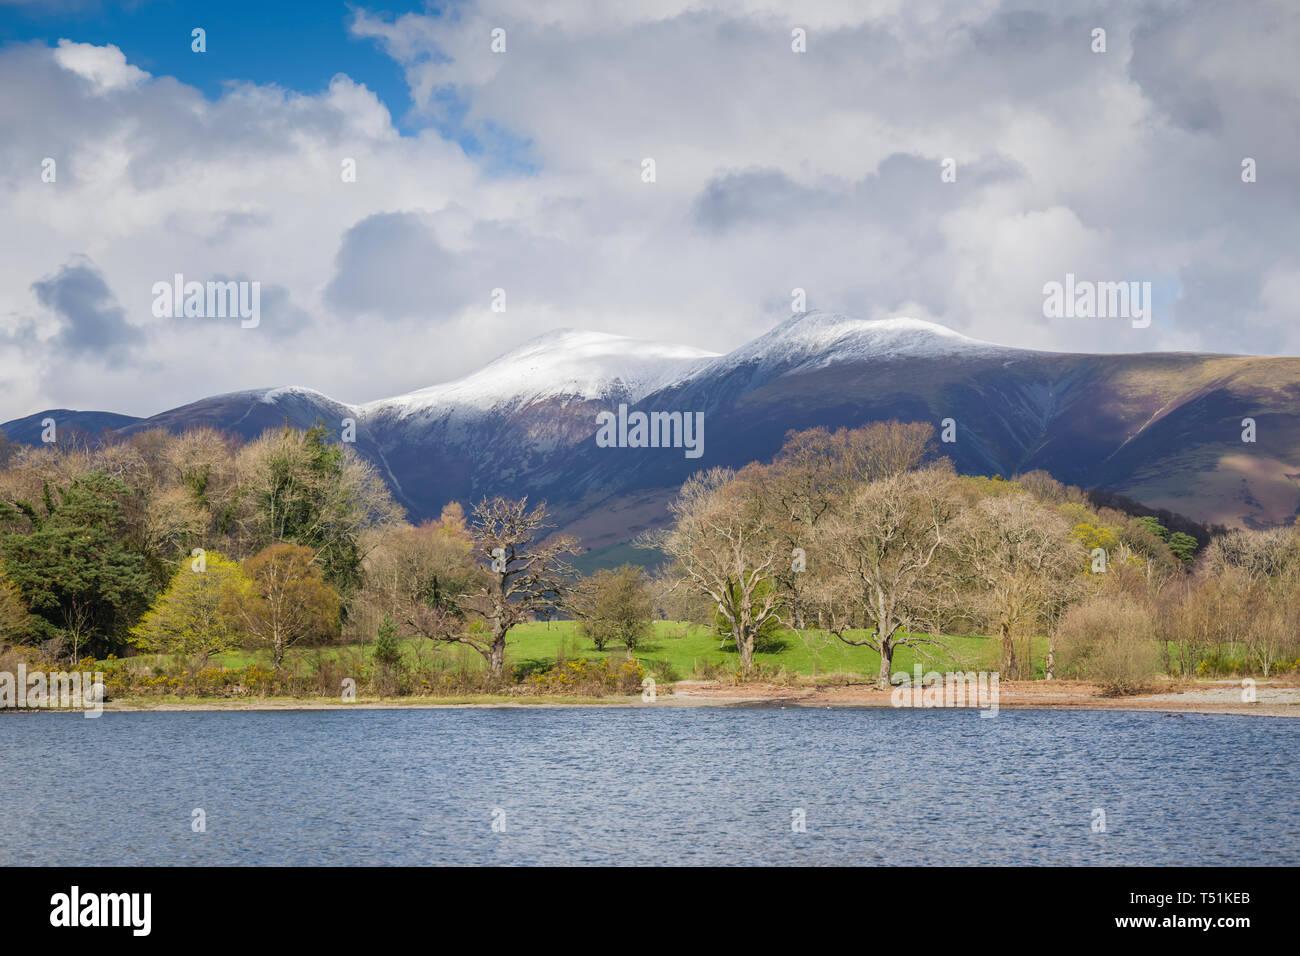 Derwentwater in spring with snow on Skiddaw, Cumbria, UK. Stock Photo